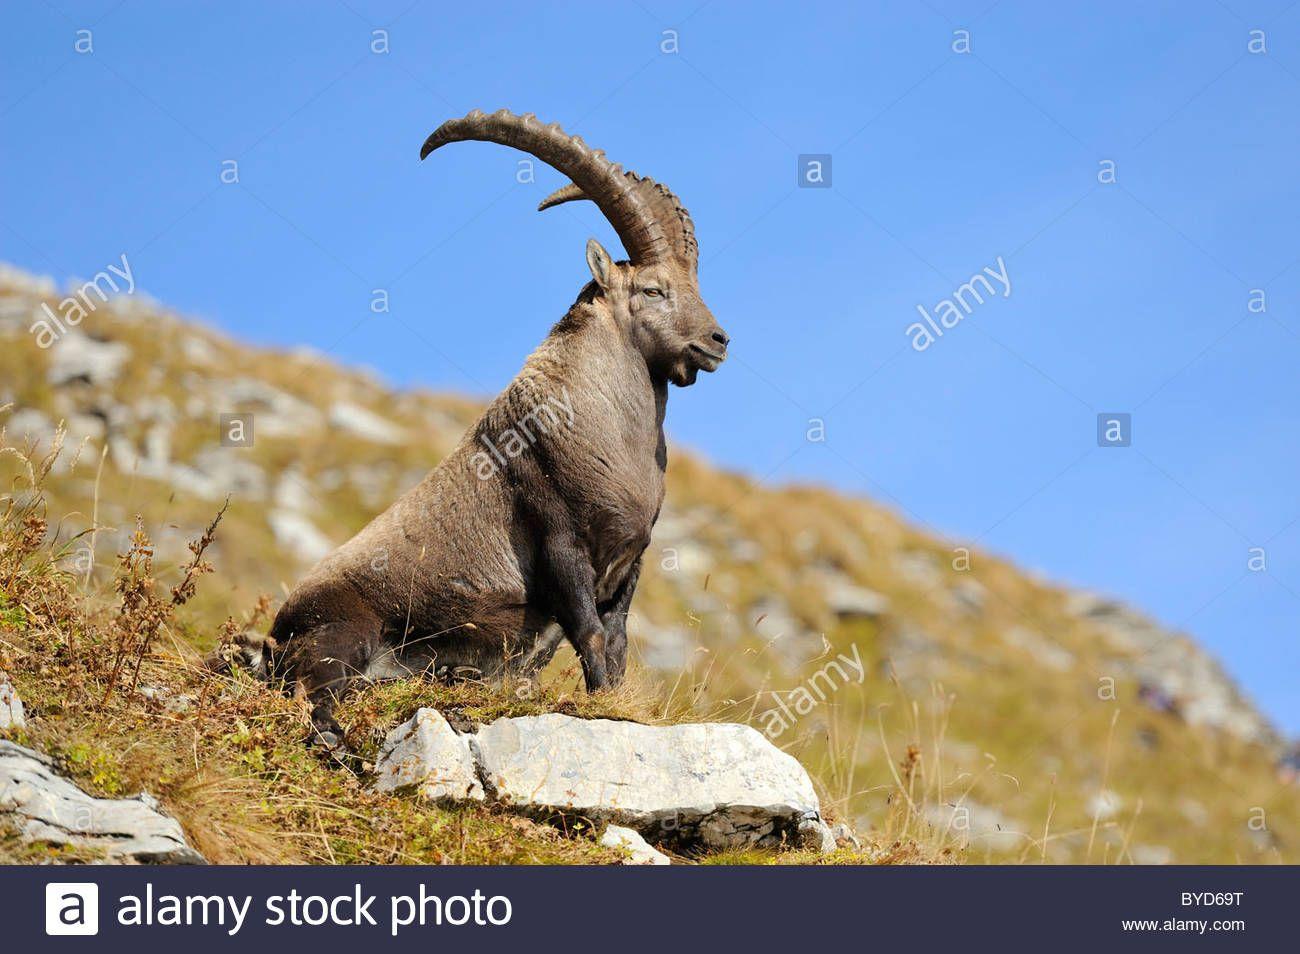 ibex - Google Search   Alpine ibex, Ibex, Fall colors